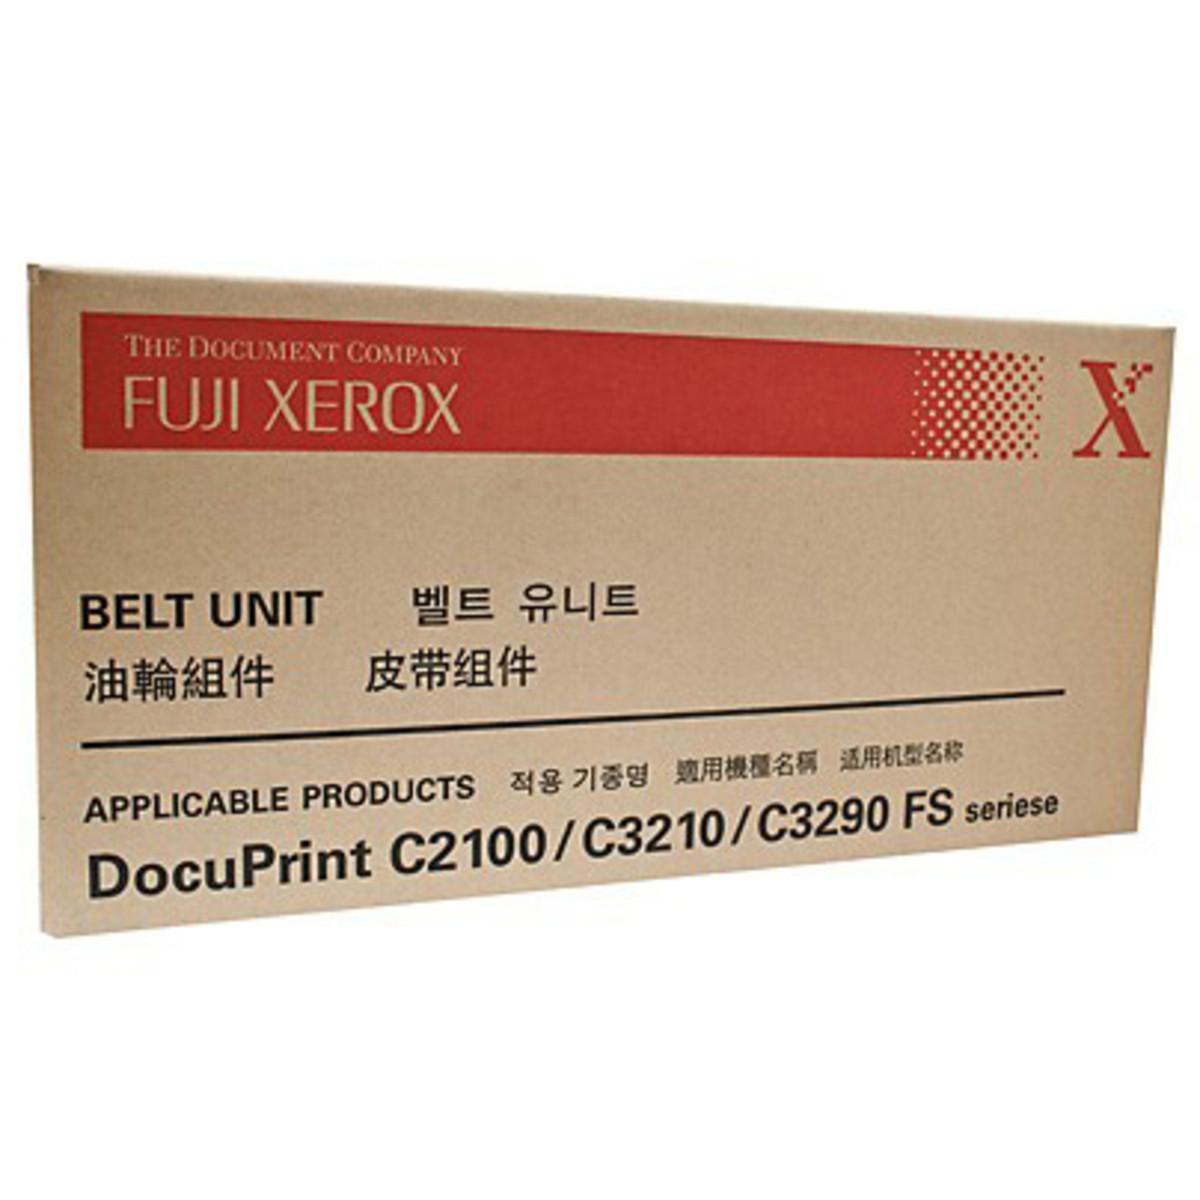 Xerox DPC2100/3210DX/3290 Belt Unit